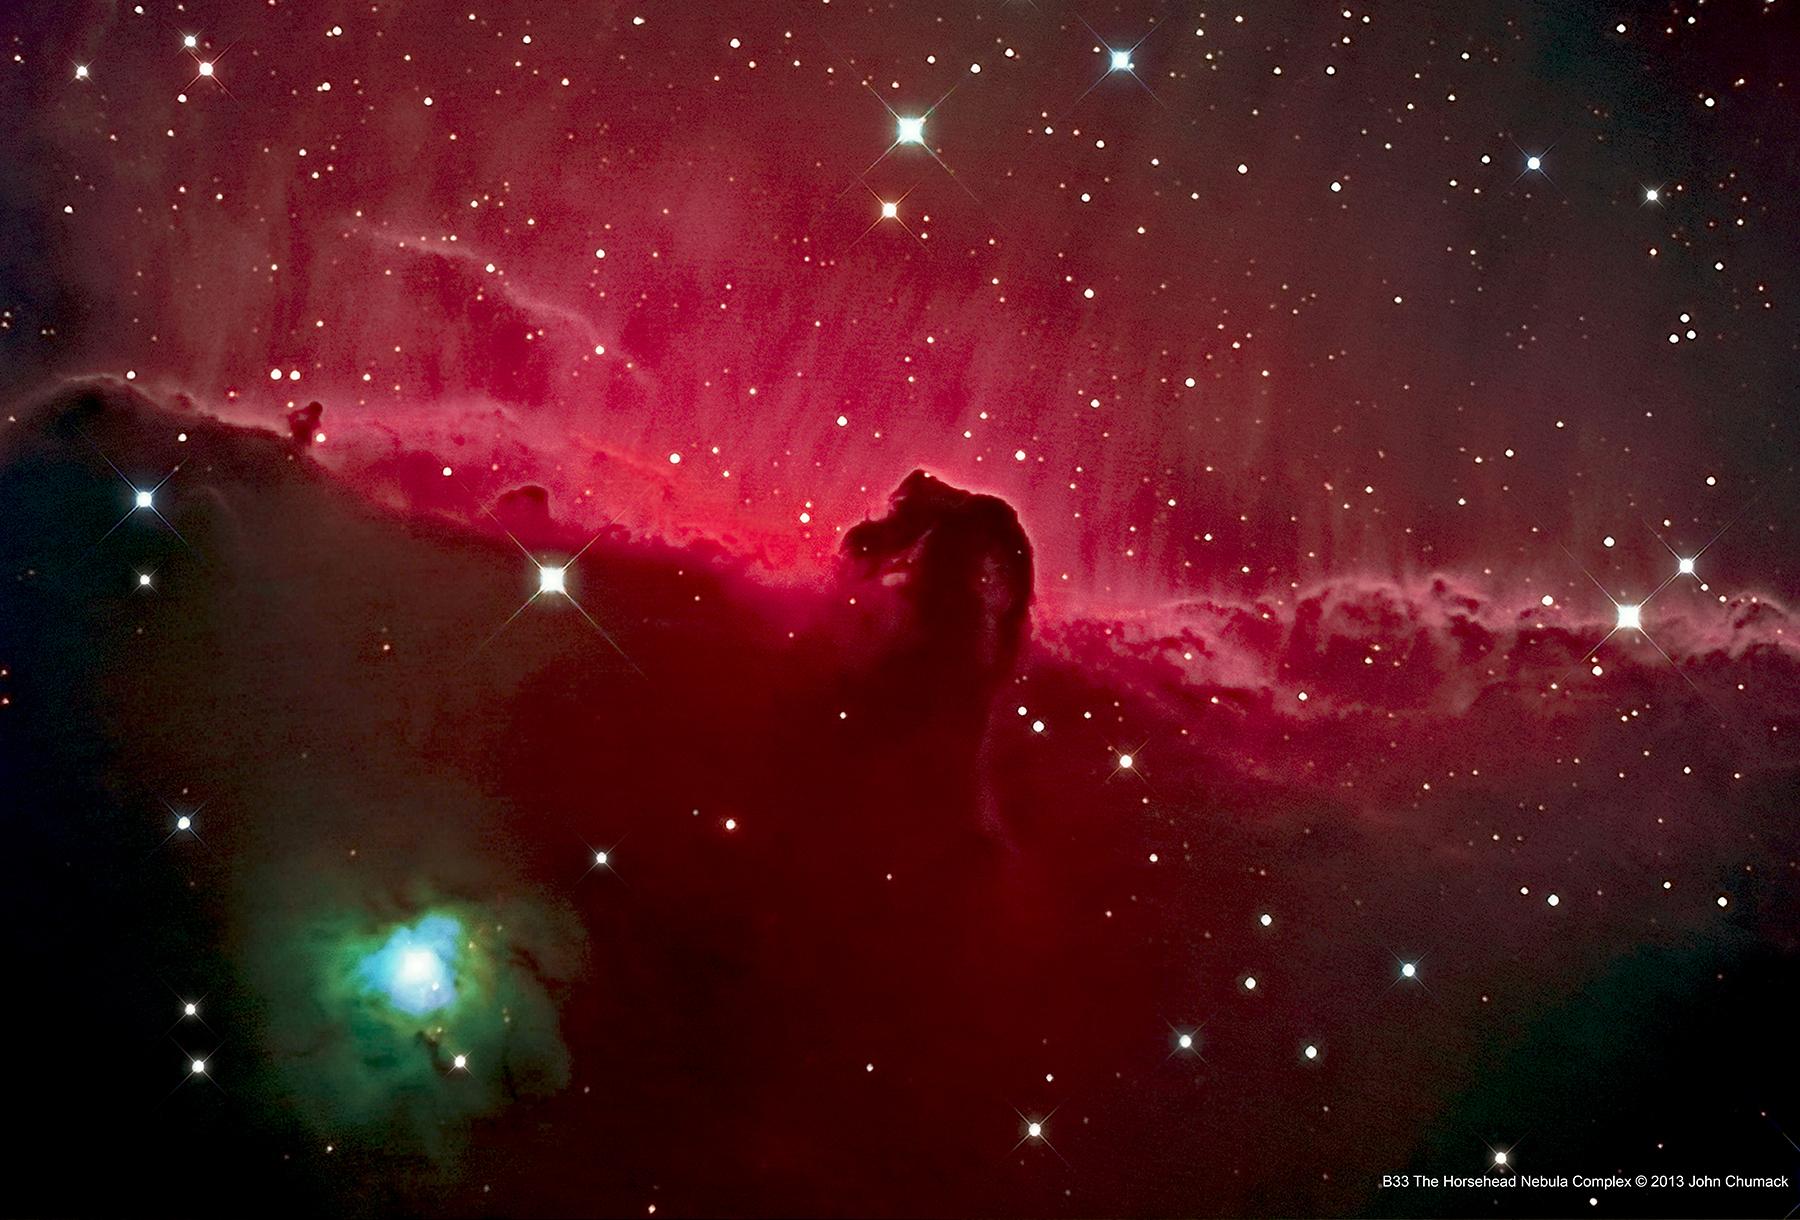 horsehead nebula - photo #16